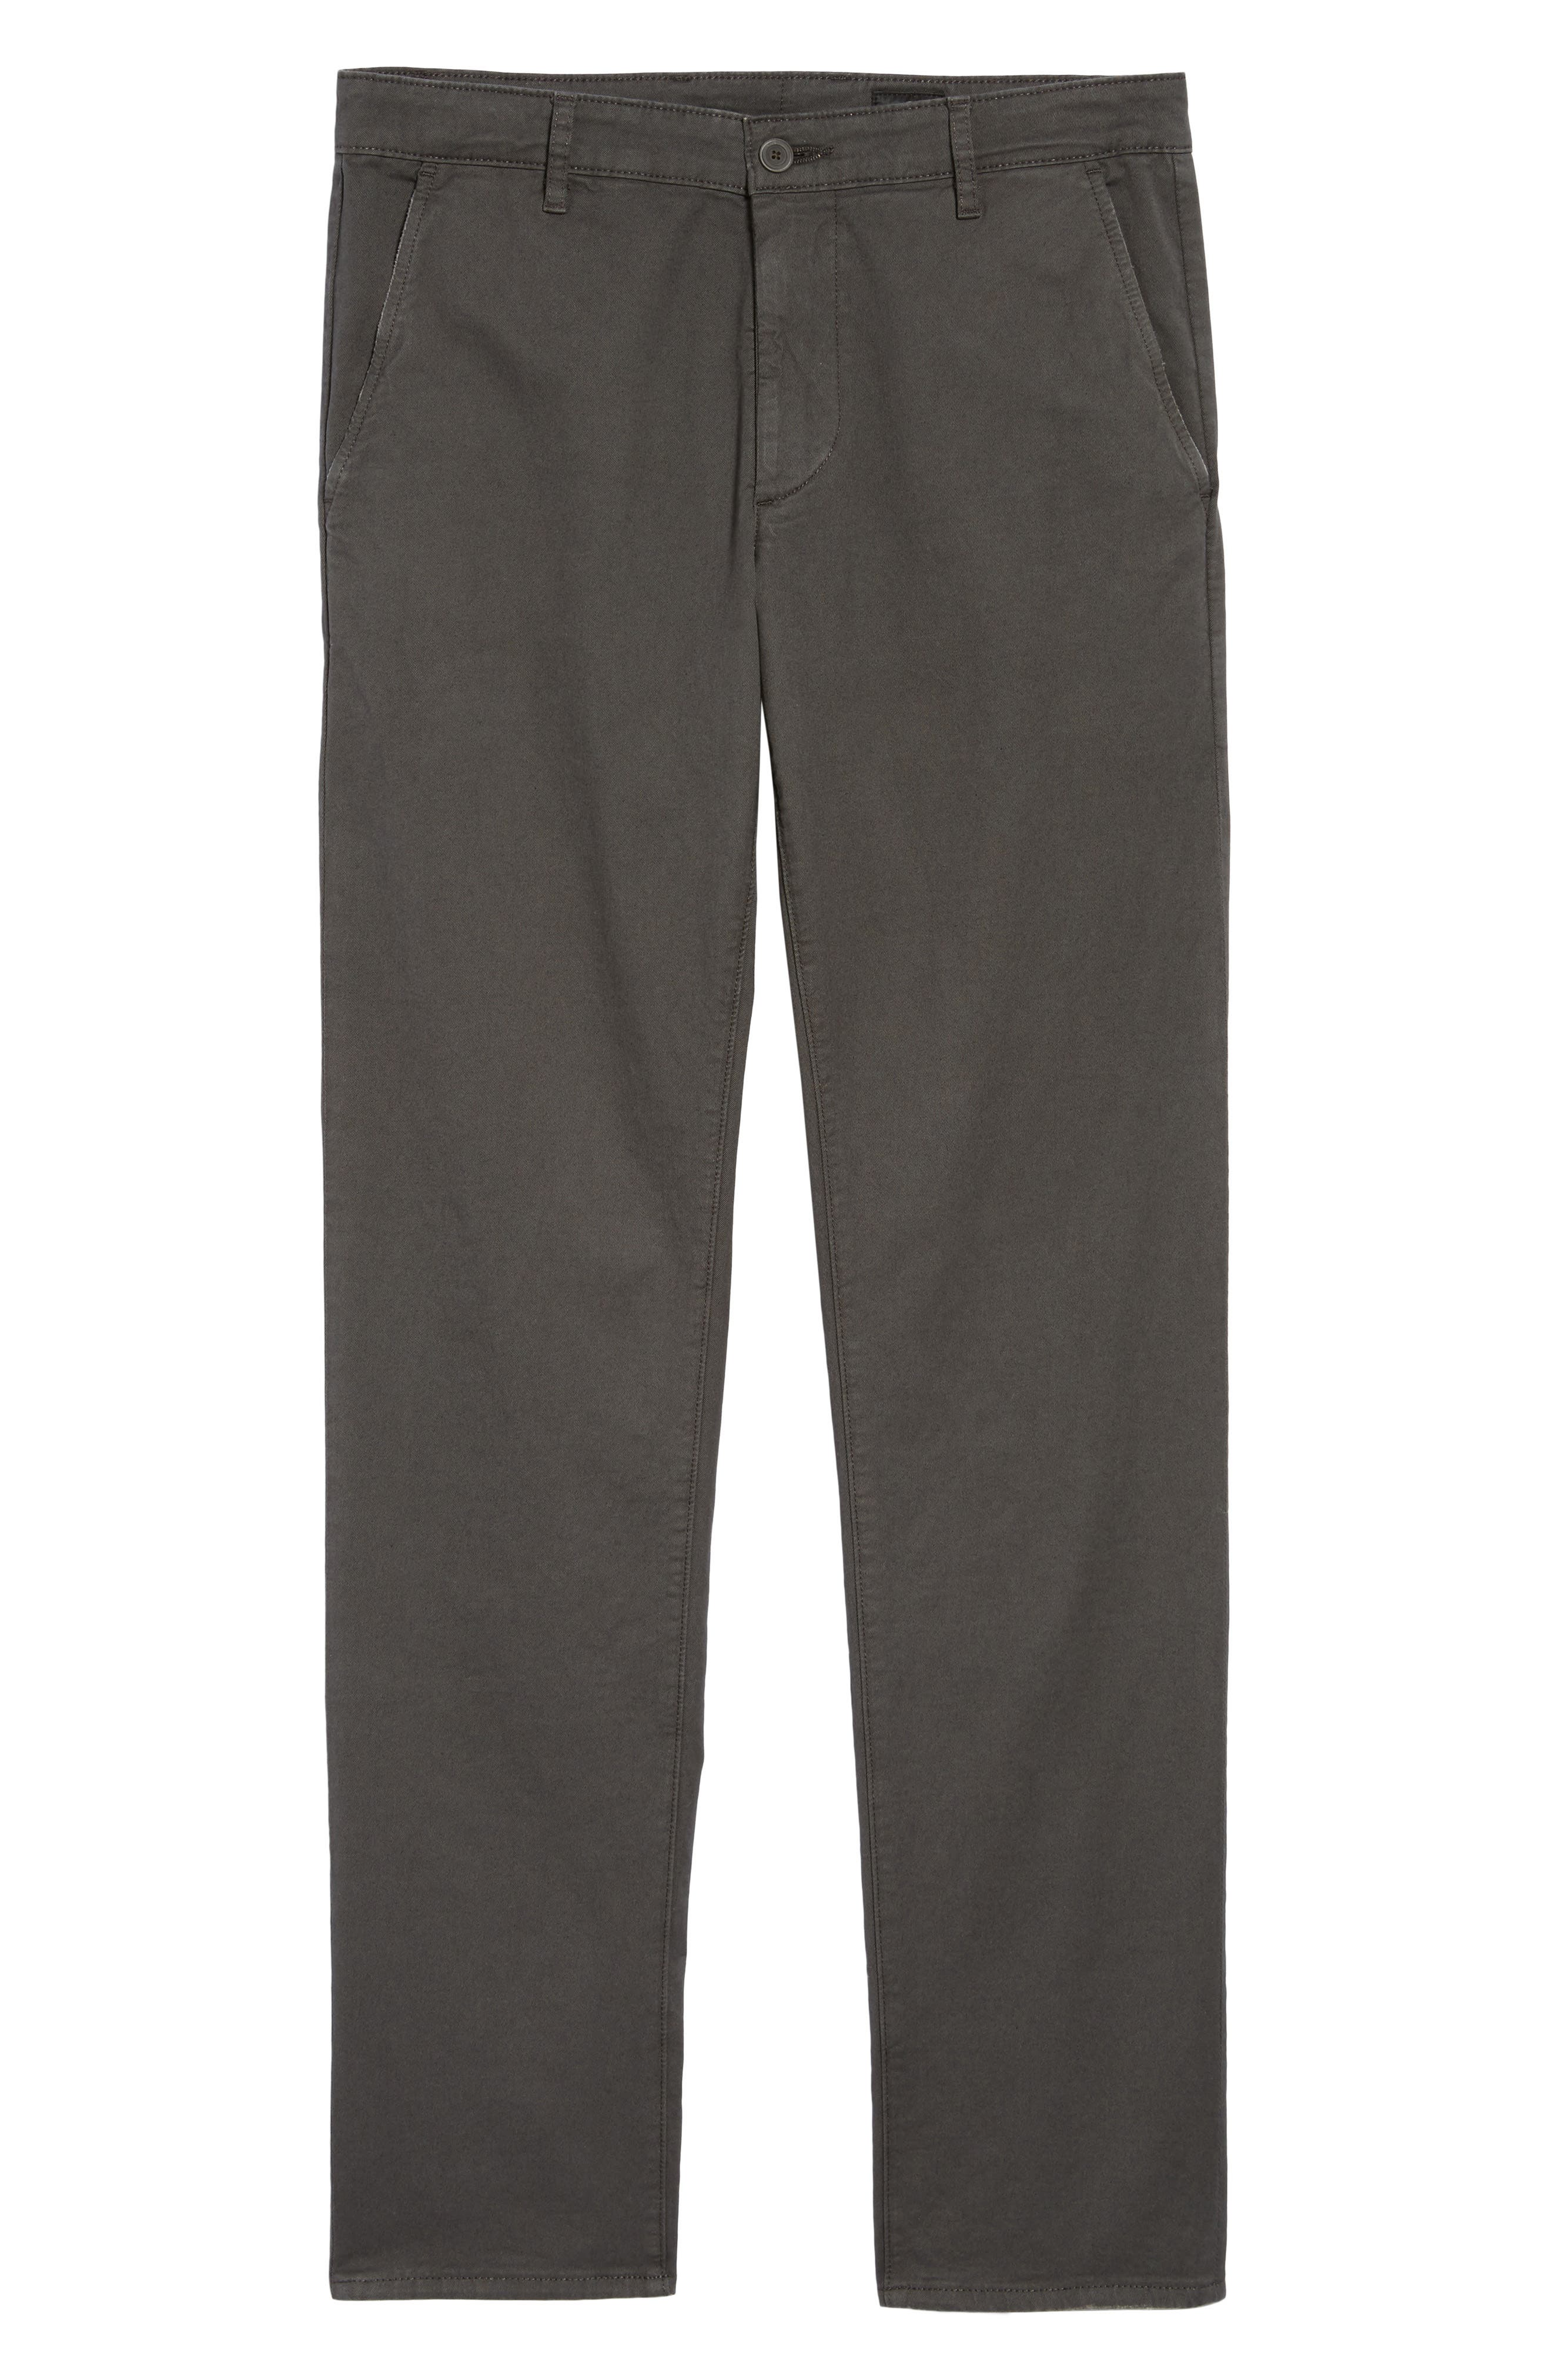 Marshall Slim Straight Leg Chino Pants,                             Alternate thumbnail 6, color,                             039